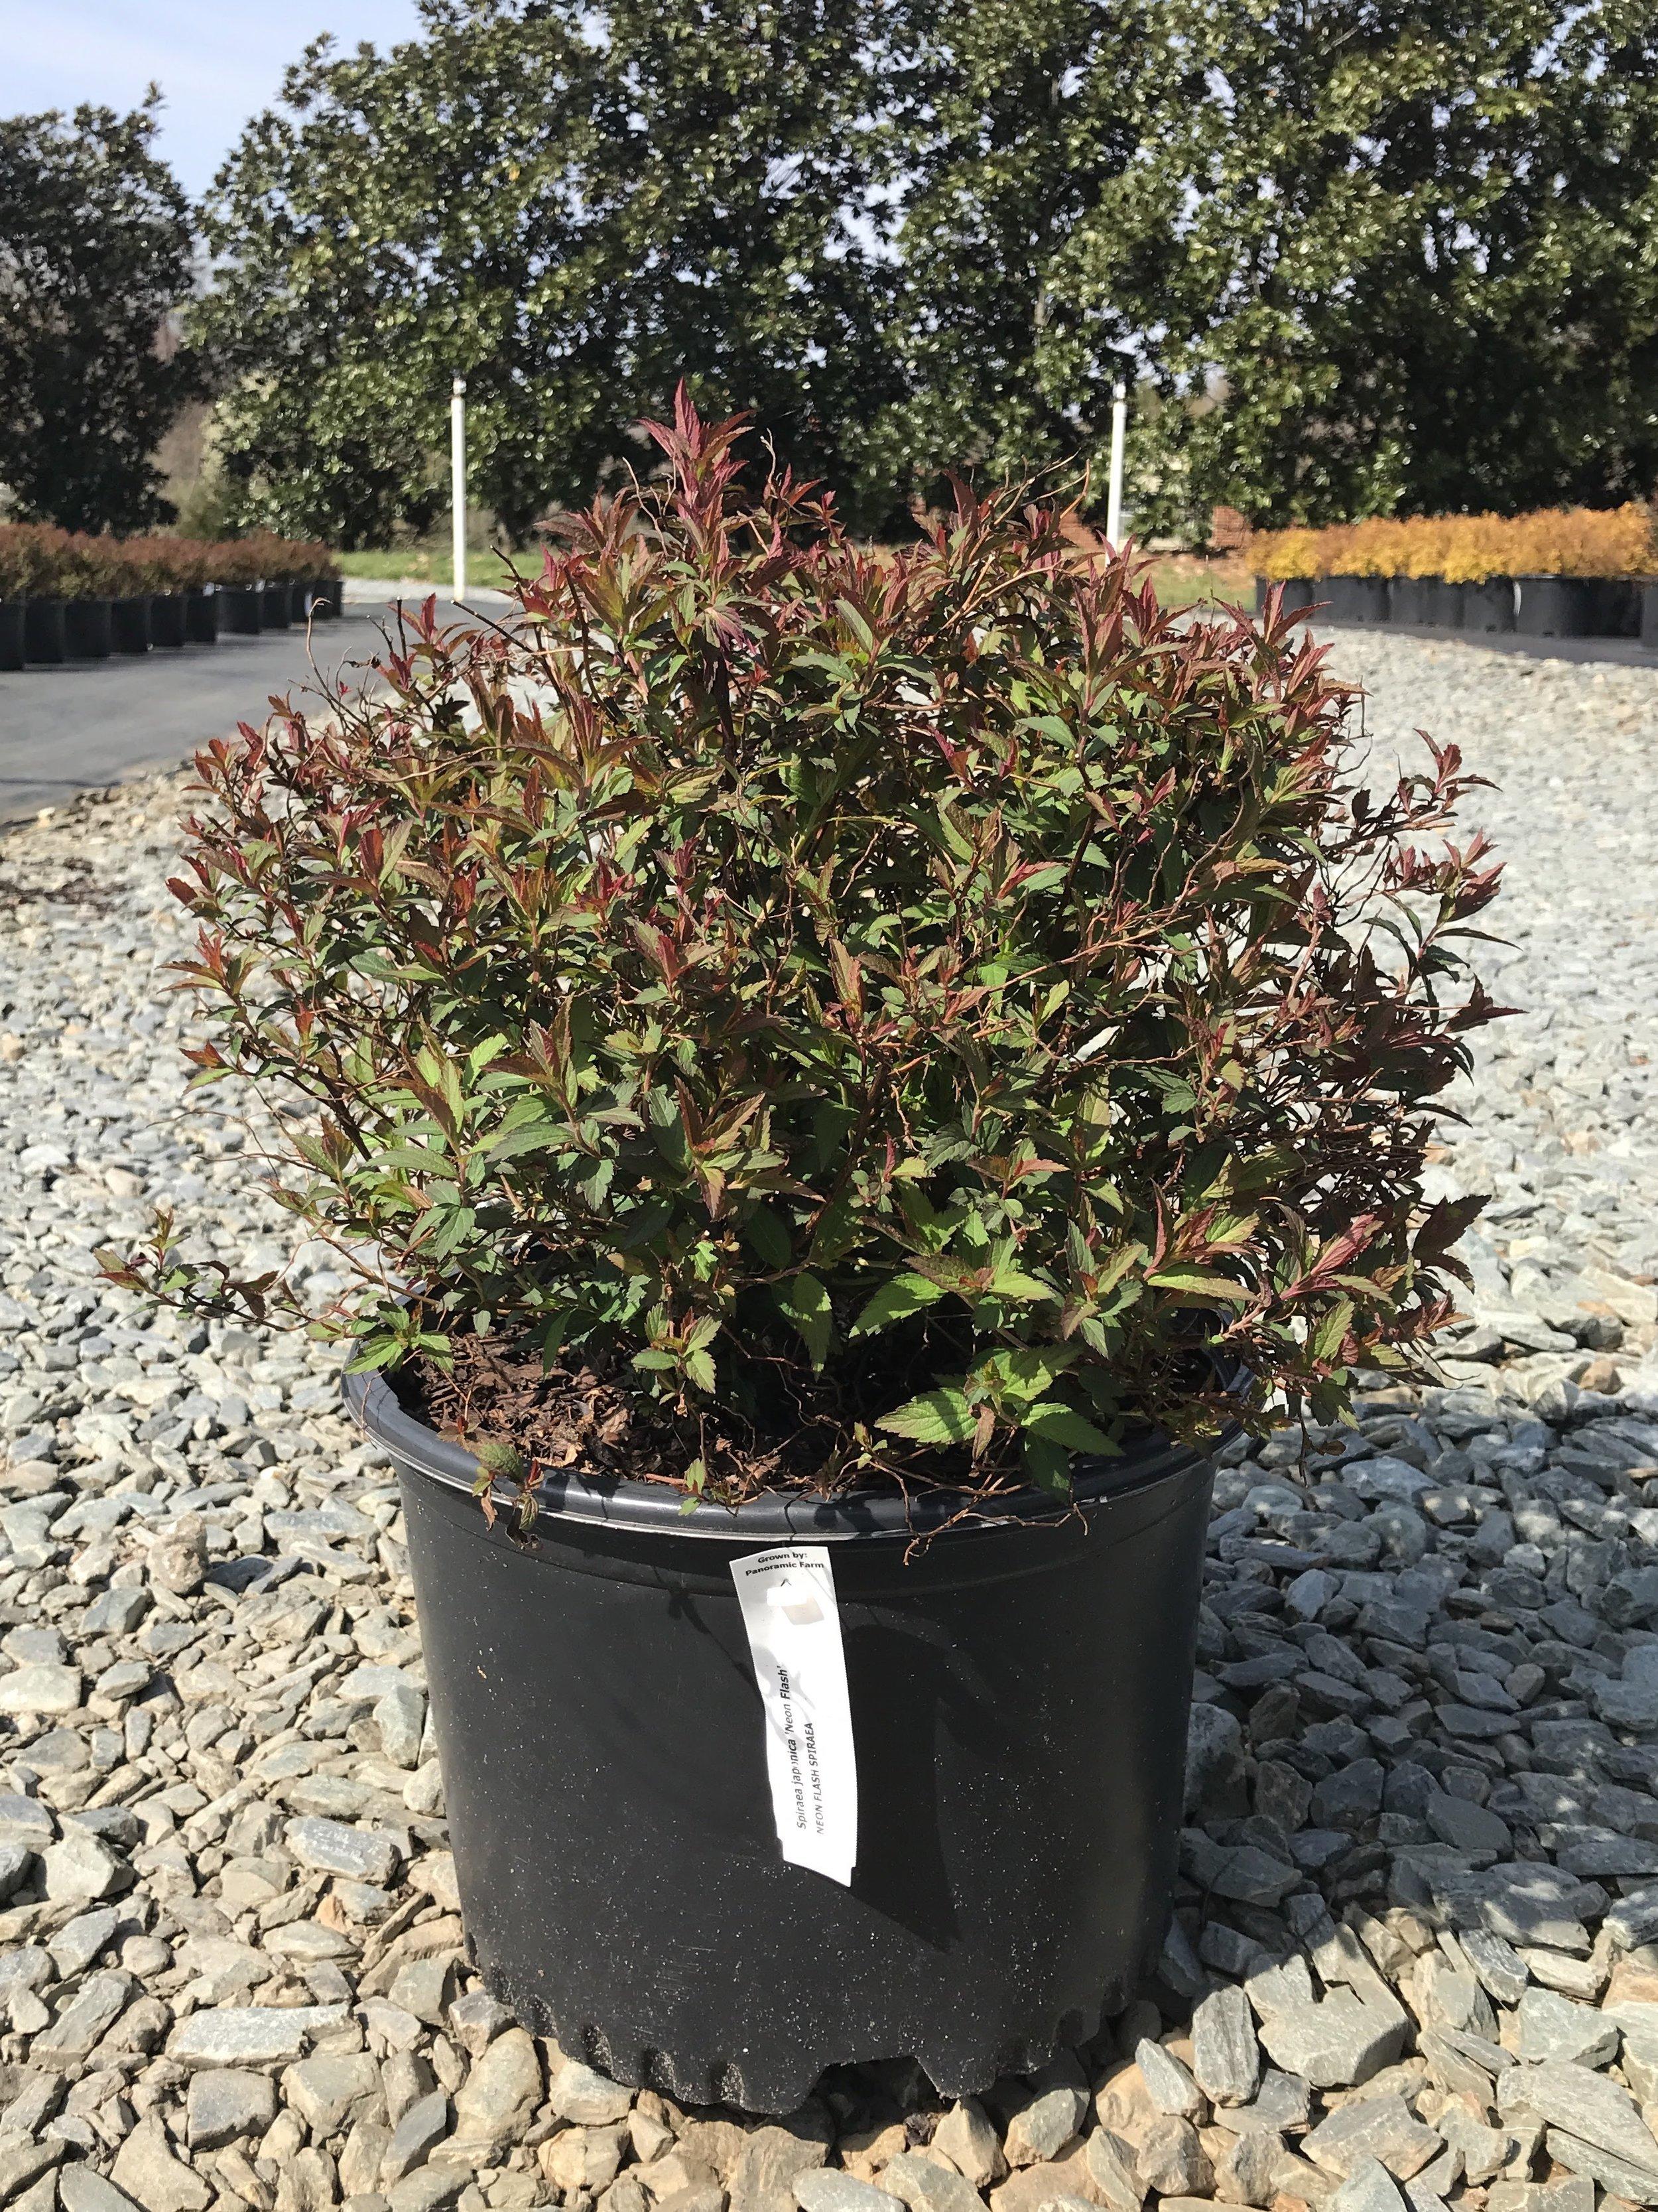 (overstock) Spiraea japonica 'Neon Flash' - 3 gallon